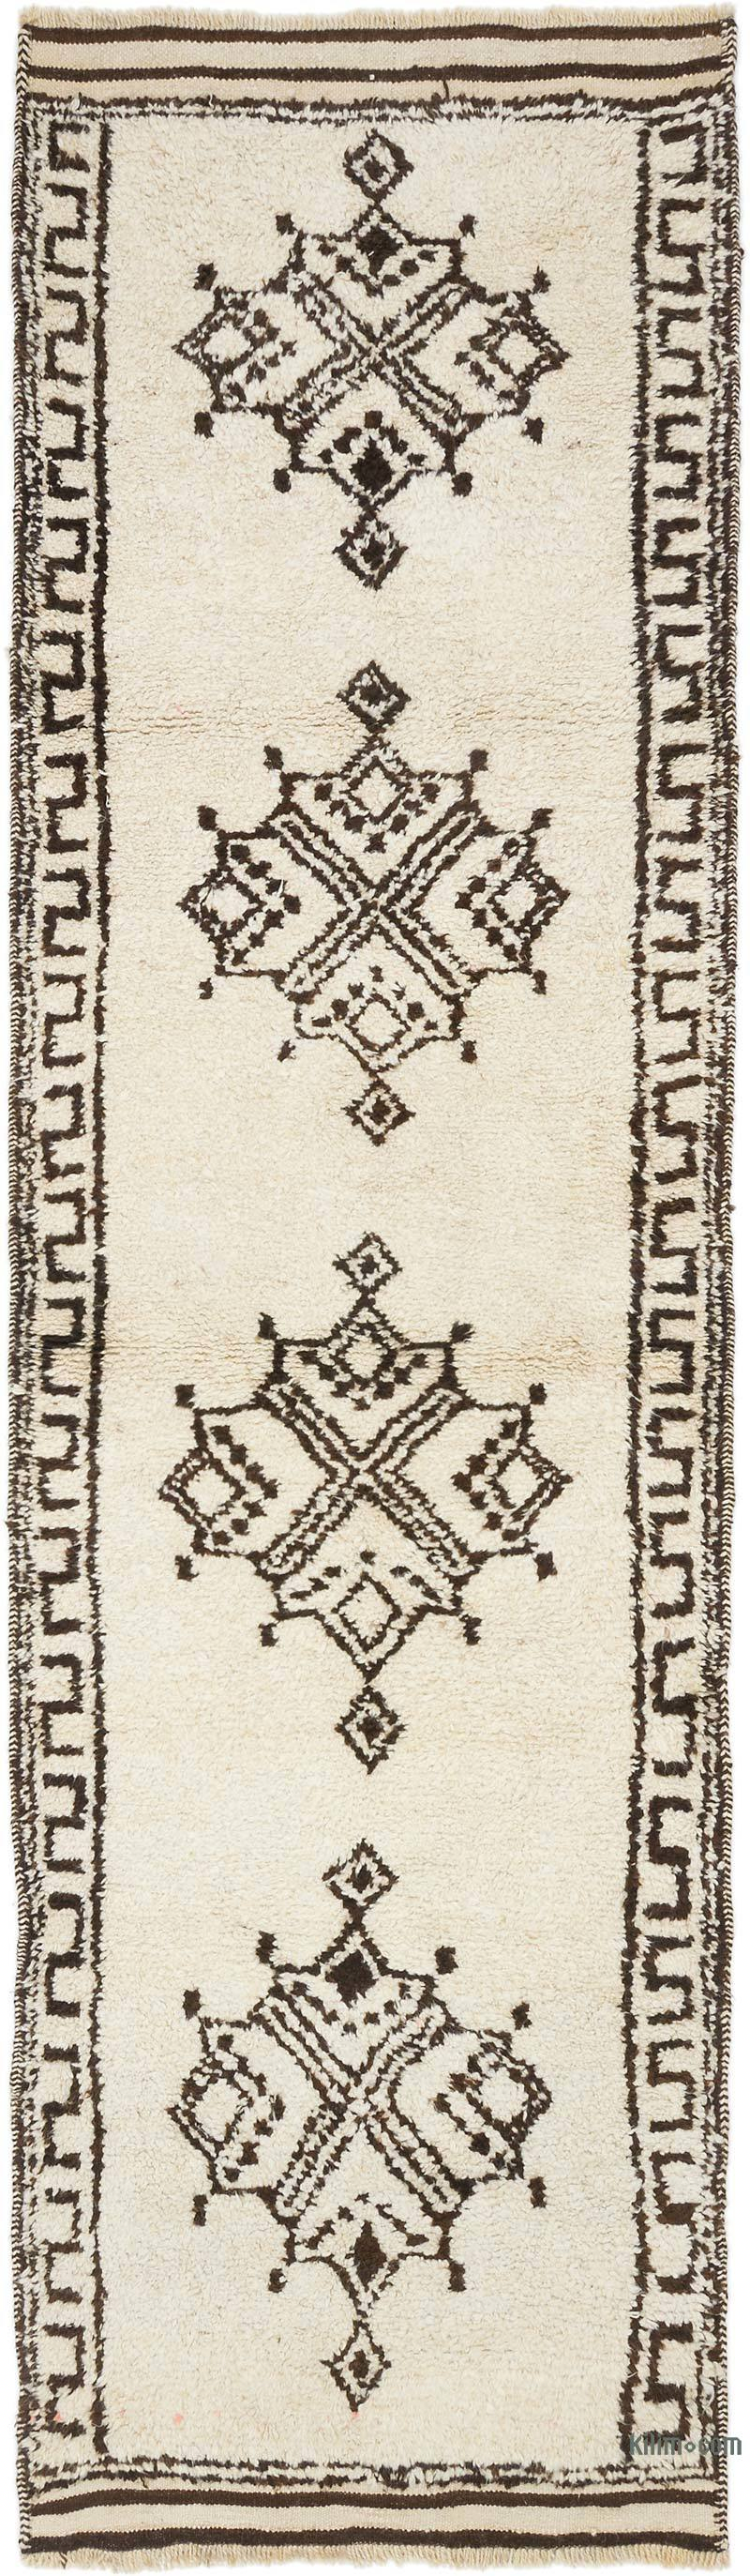 "Vintage Turkish Runner Rug - 3' 3"" x 11' 6"" (39 in. x 138 in.) - K0054605"